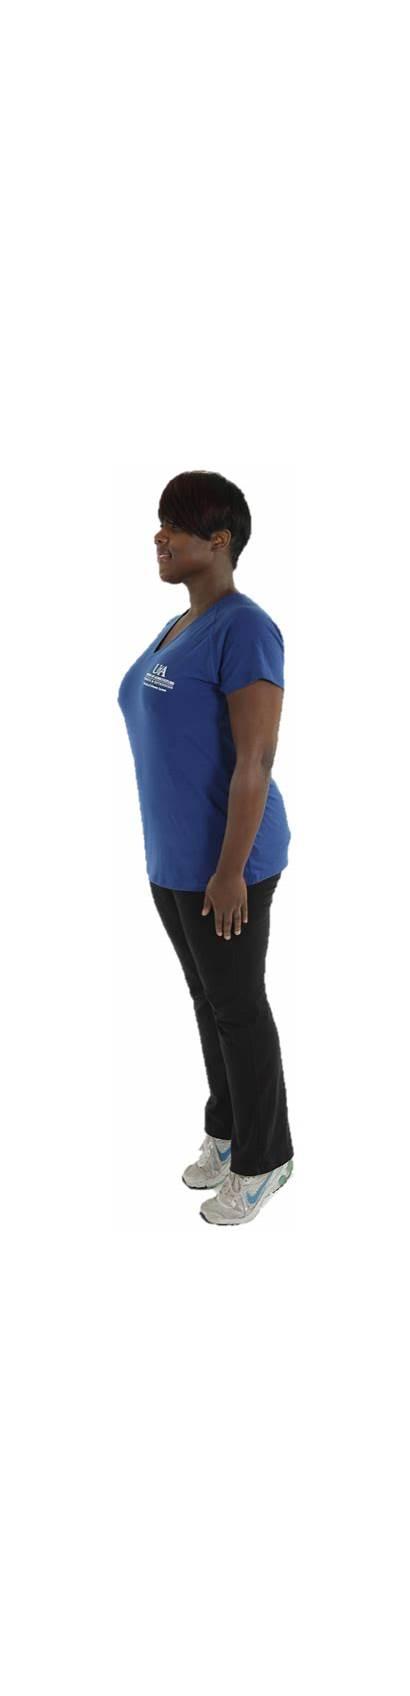 Calf Exercise Types Raise